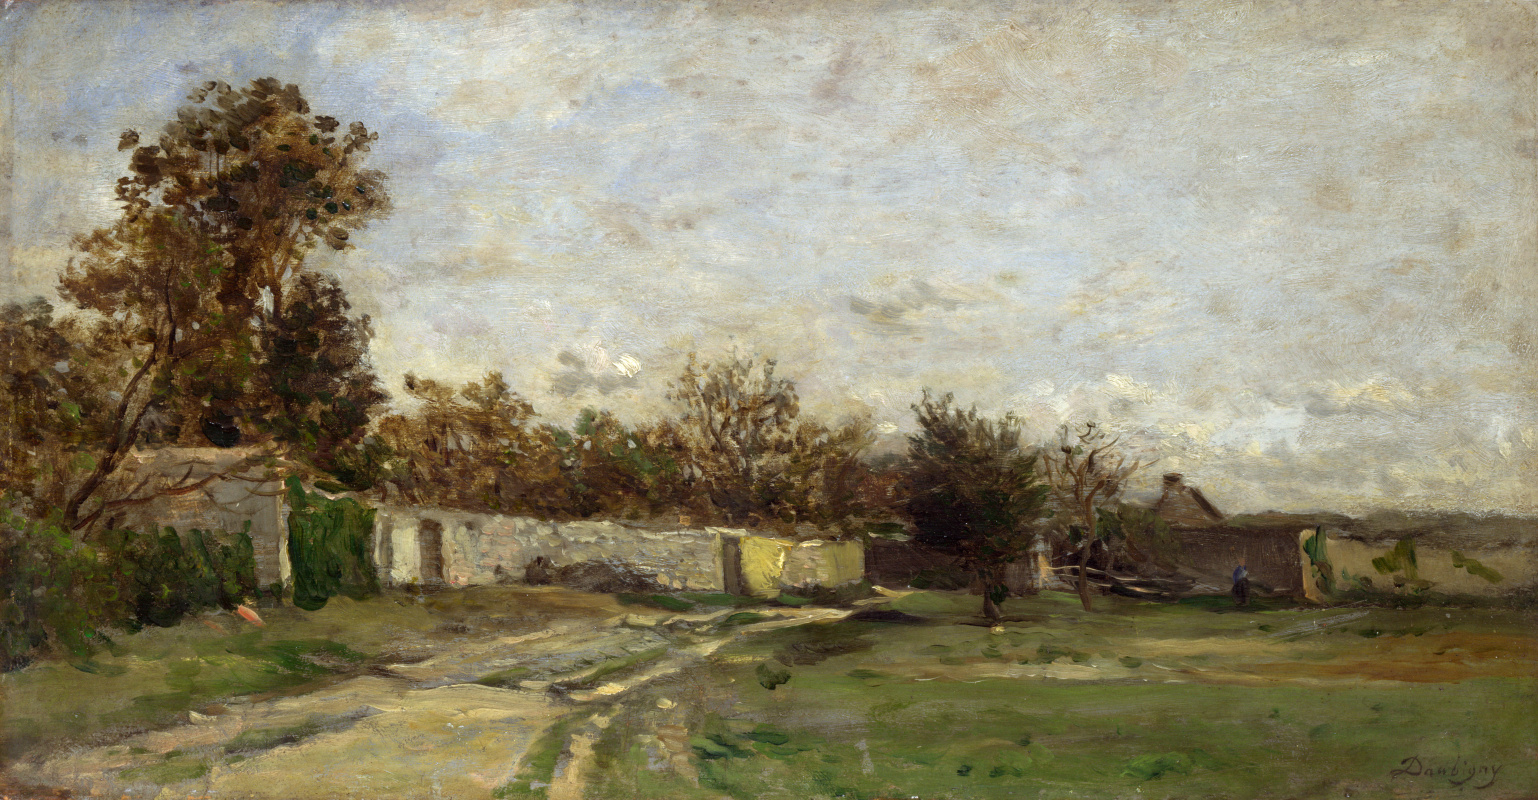 Шарль-Франсуа Добиньи. Стены сада